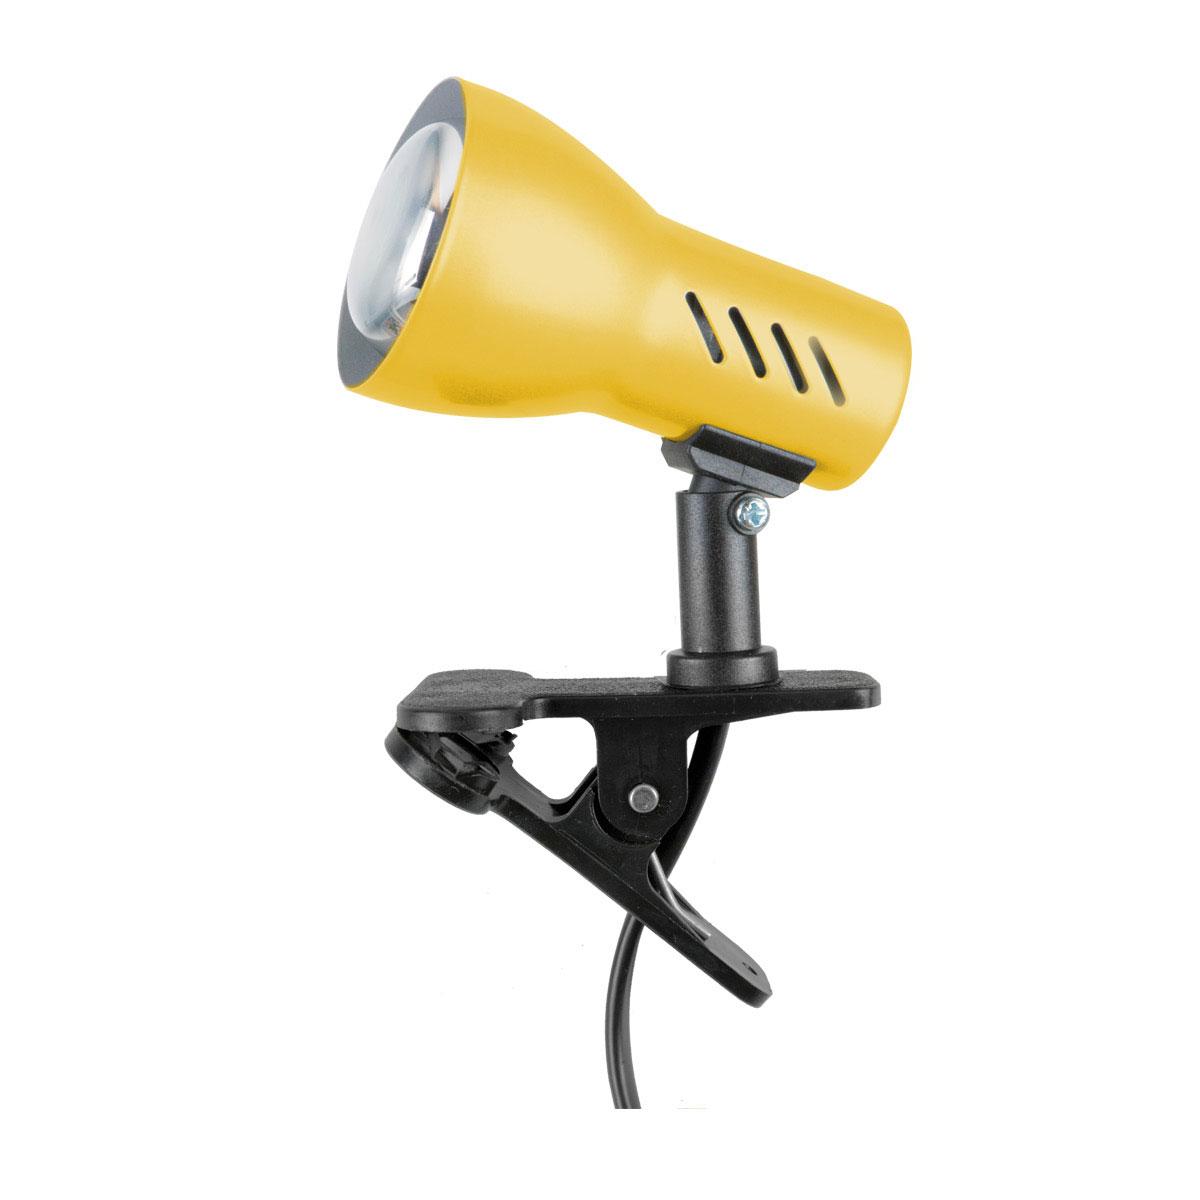 spot light lampe zum klemmen klemmleuchte clampspot klemmlampe gelb e27 60w ebay. Black Bedroom Furniture Sets. Home Design Ideas